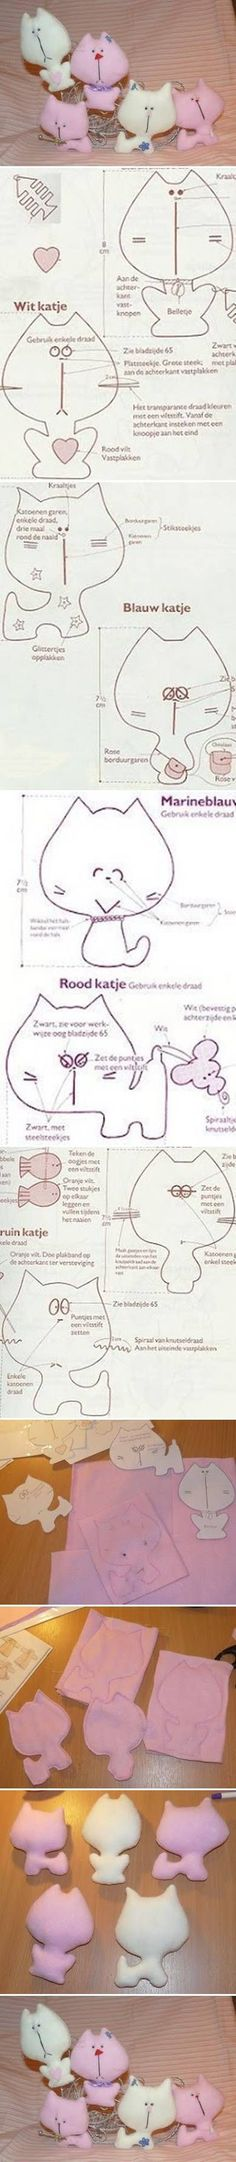 DIY Cute Little Fabric Cats DIY Projects   UsefulDIY.com Follow Us on Facebook --> https://www.facebook.com/UsefulDiy